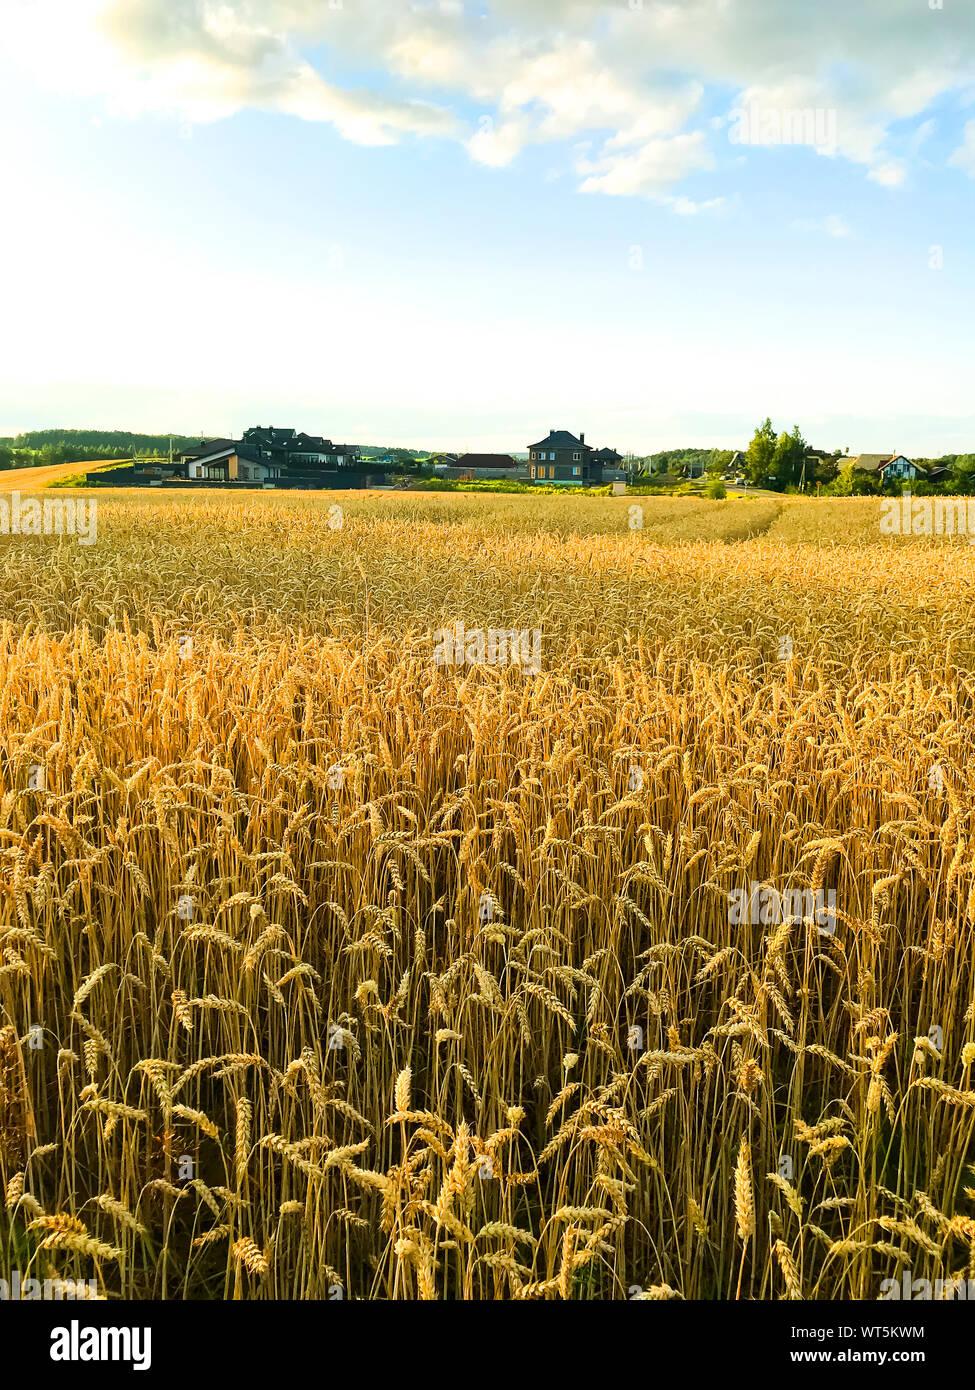 Spikes of rye on field in evening, sun. Studio Photo Stock Photo